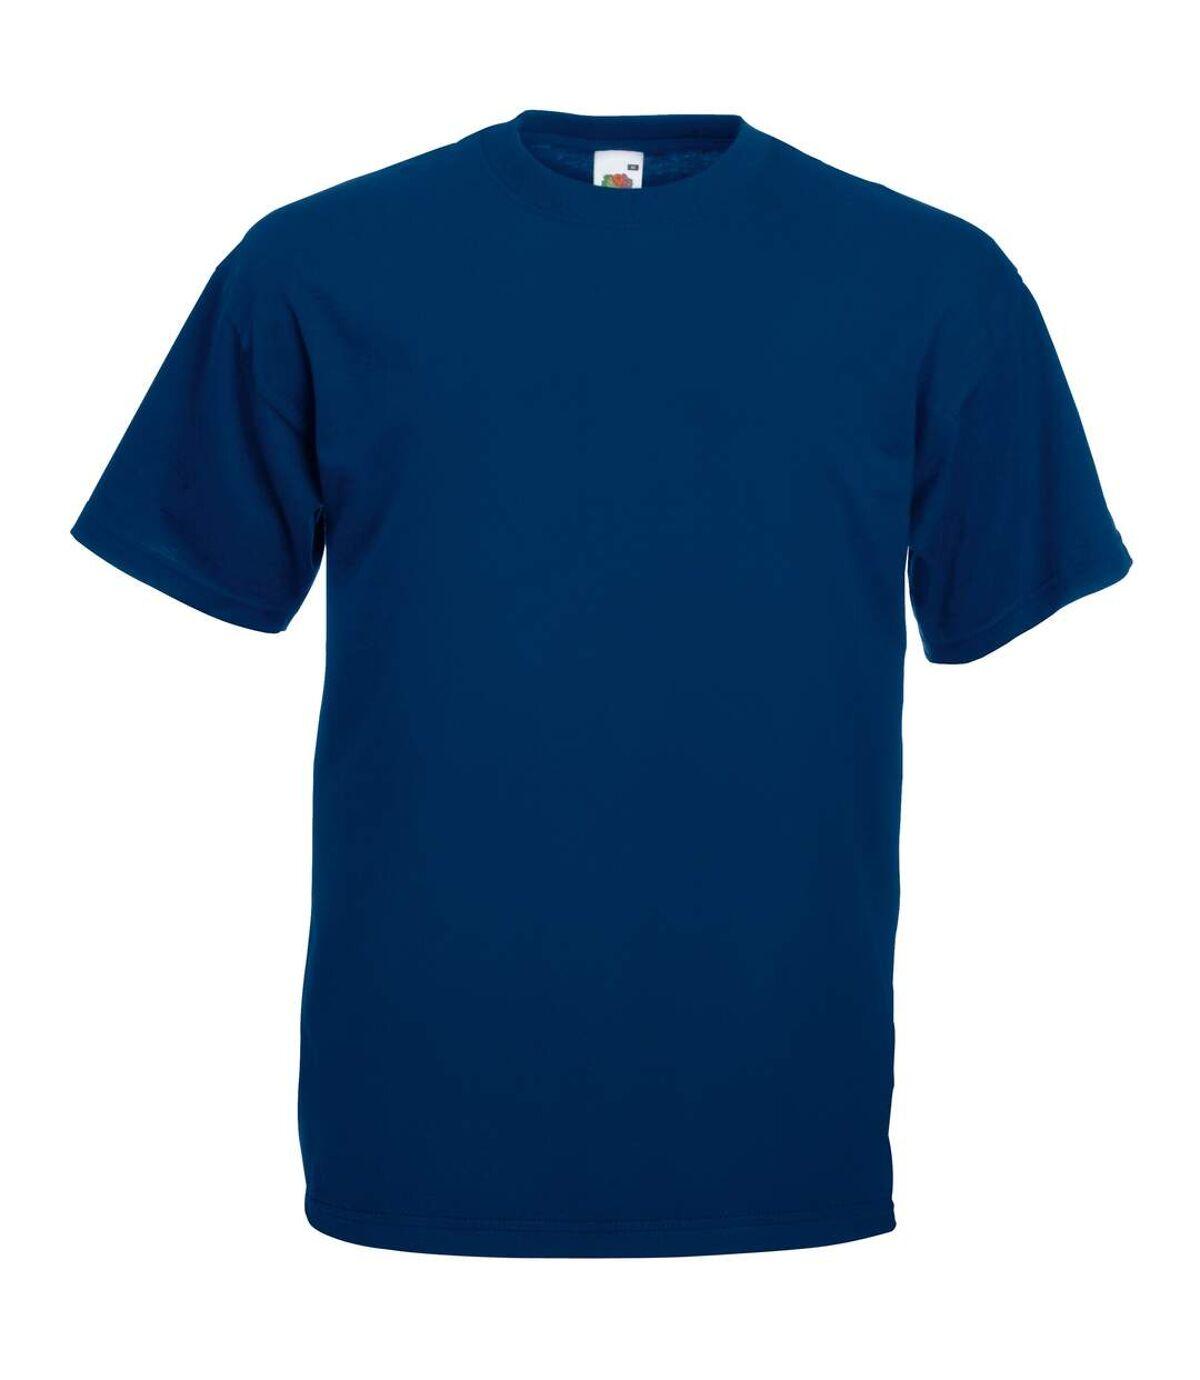 Fruit Of The Loom Mens Valueweight Short Sleeve T-Shirt (Navy) - UTBC330